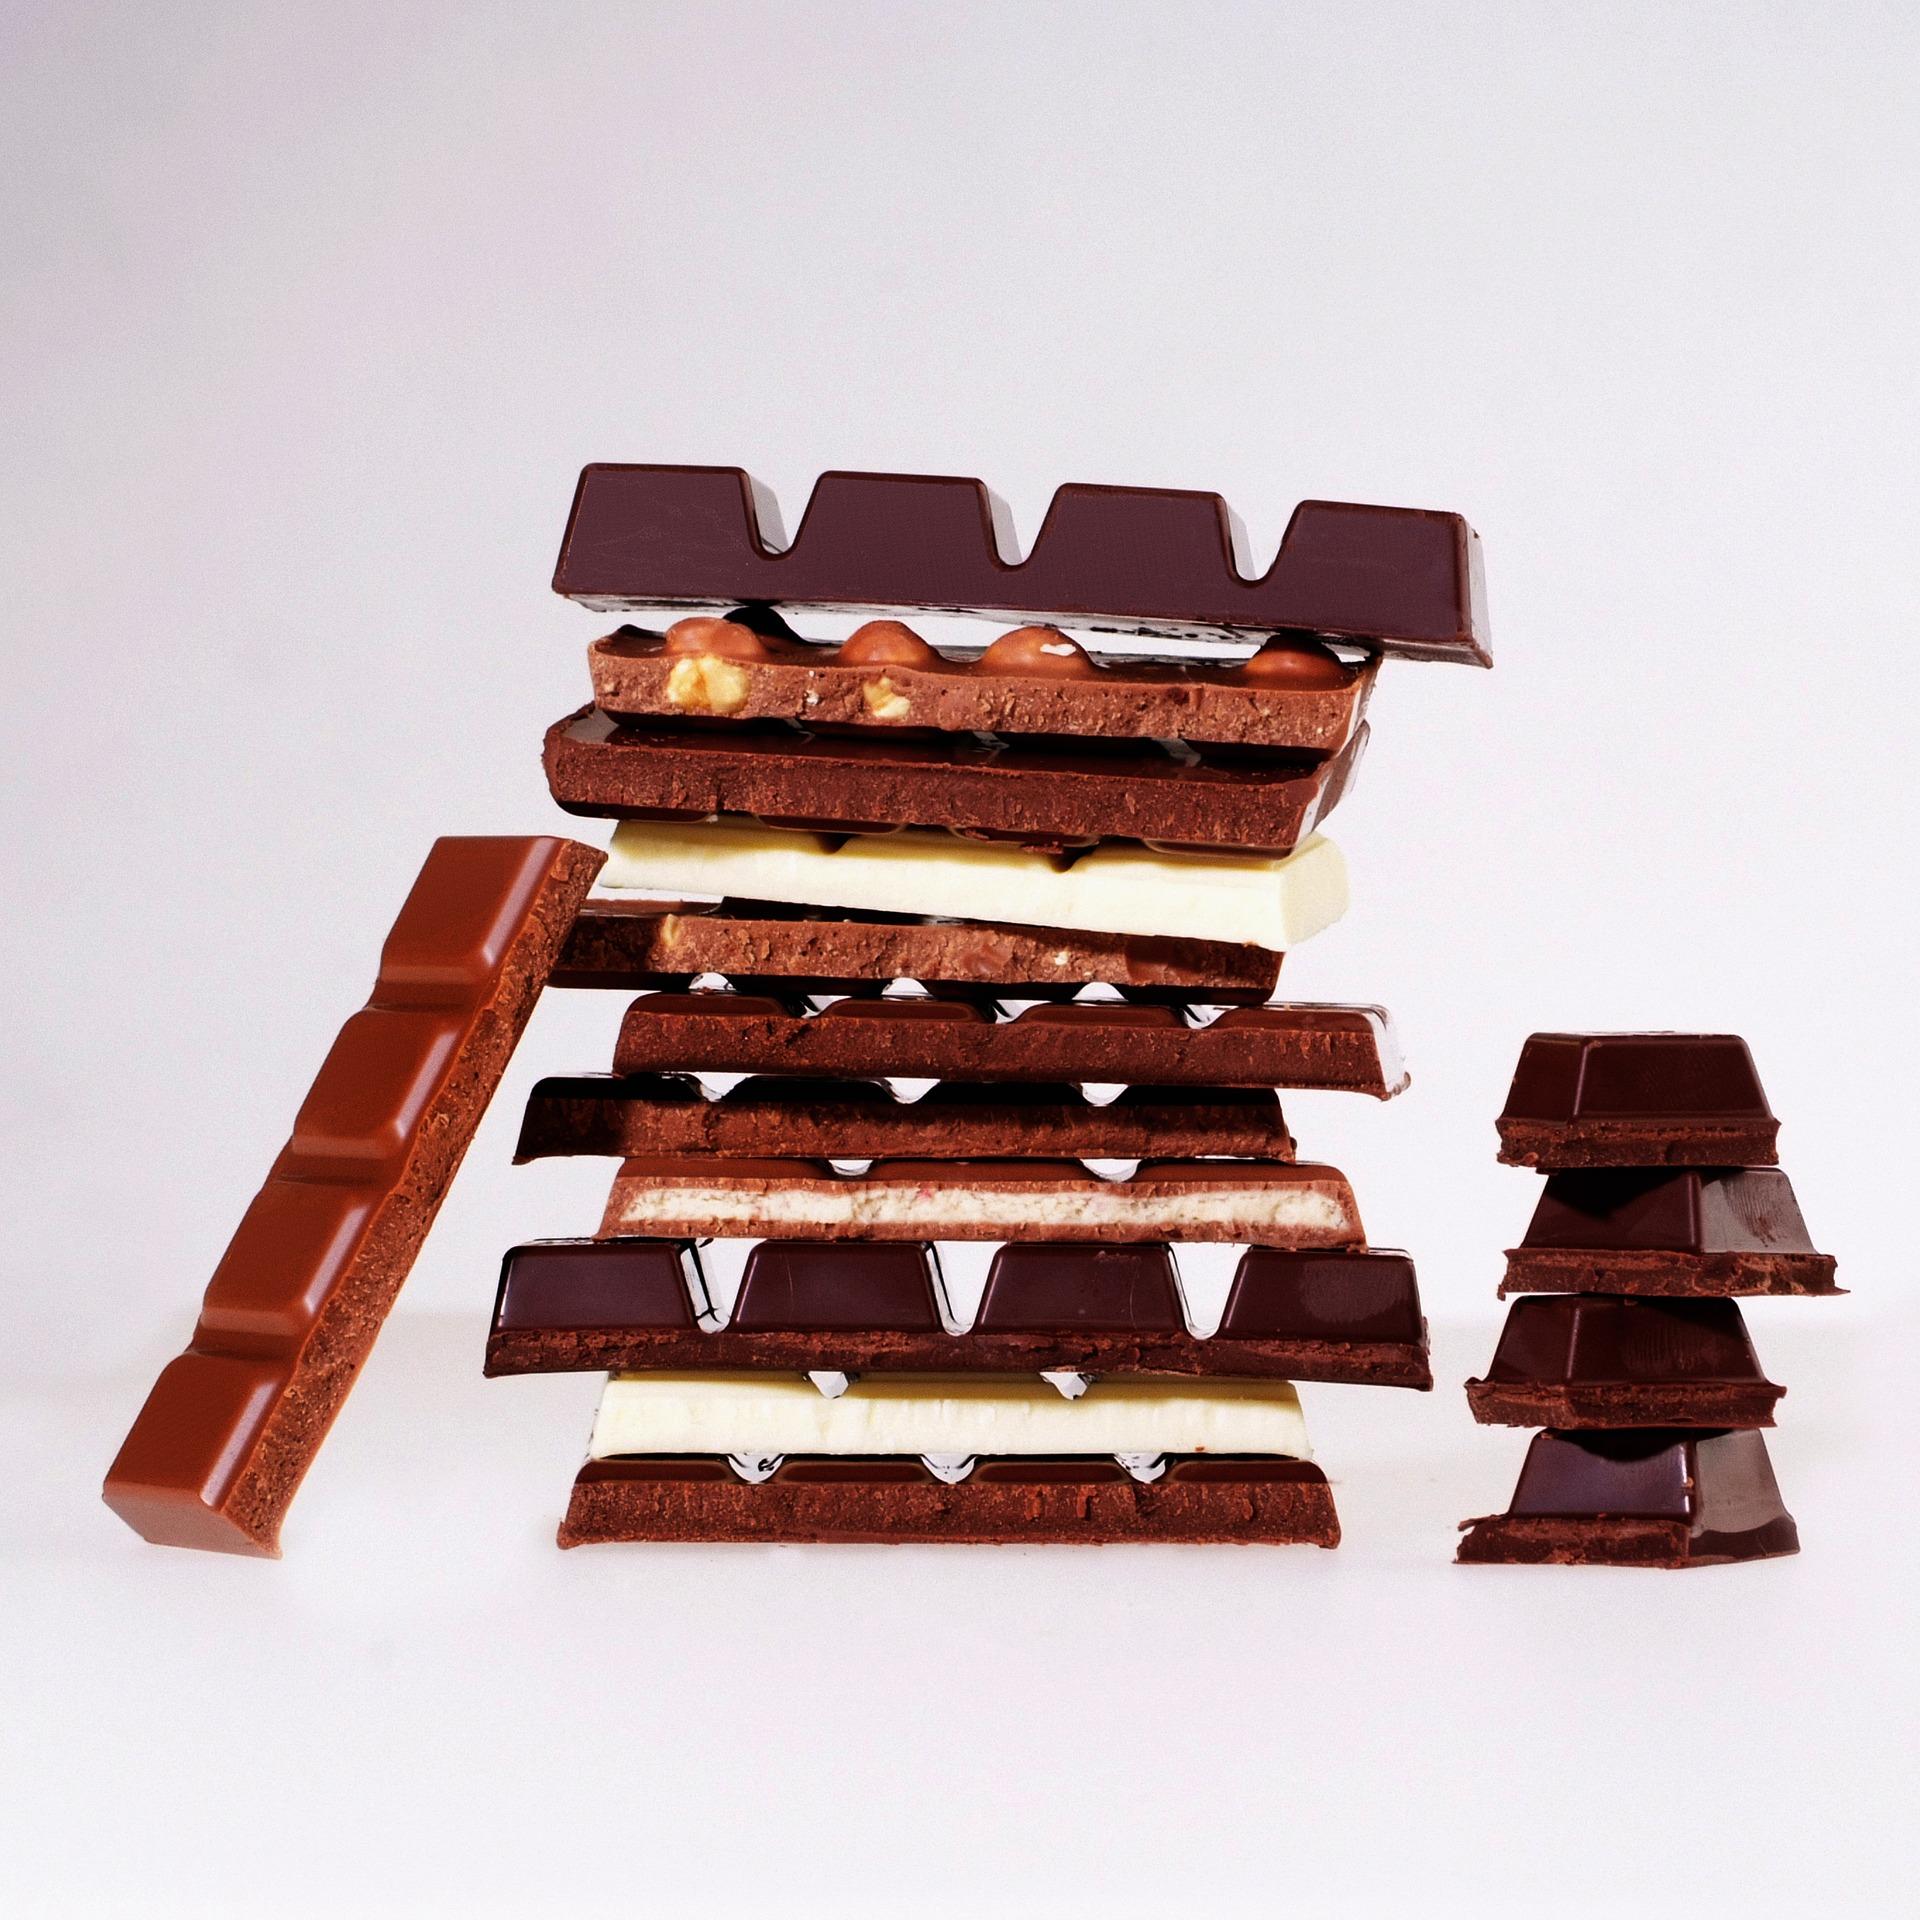 Benefits of Eating Chocolates